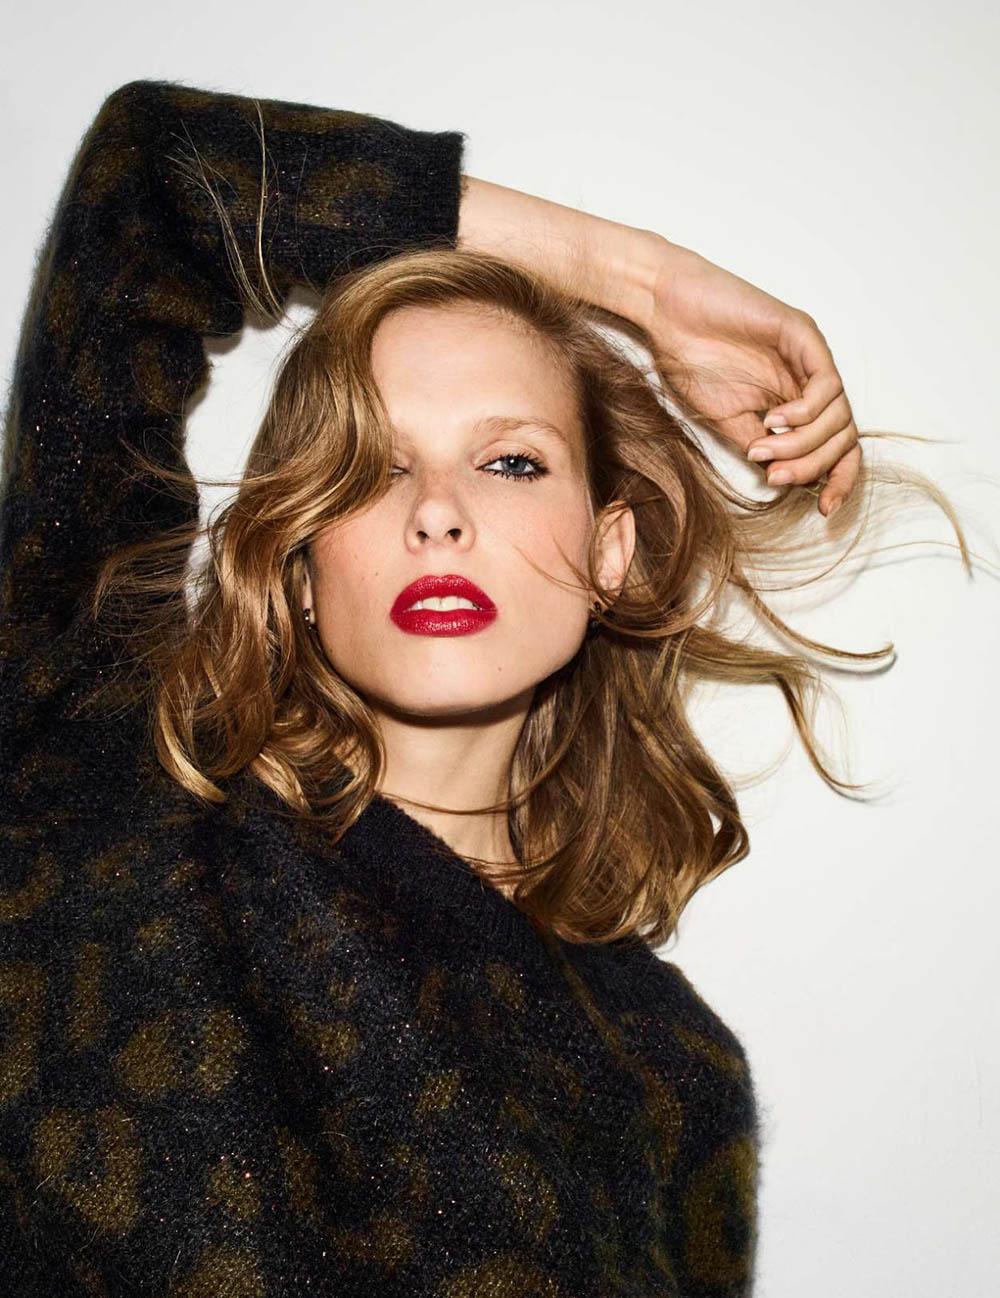 Lina Berg by Nik Hartley for Elle France August 31st, 2018